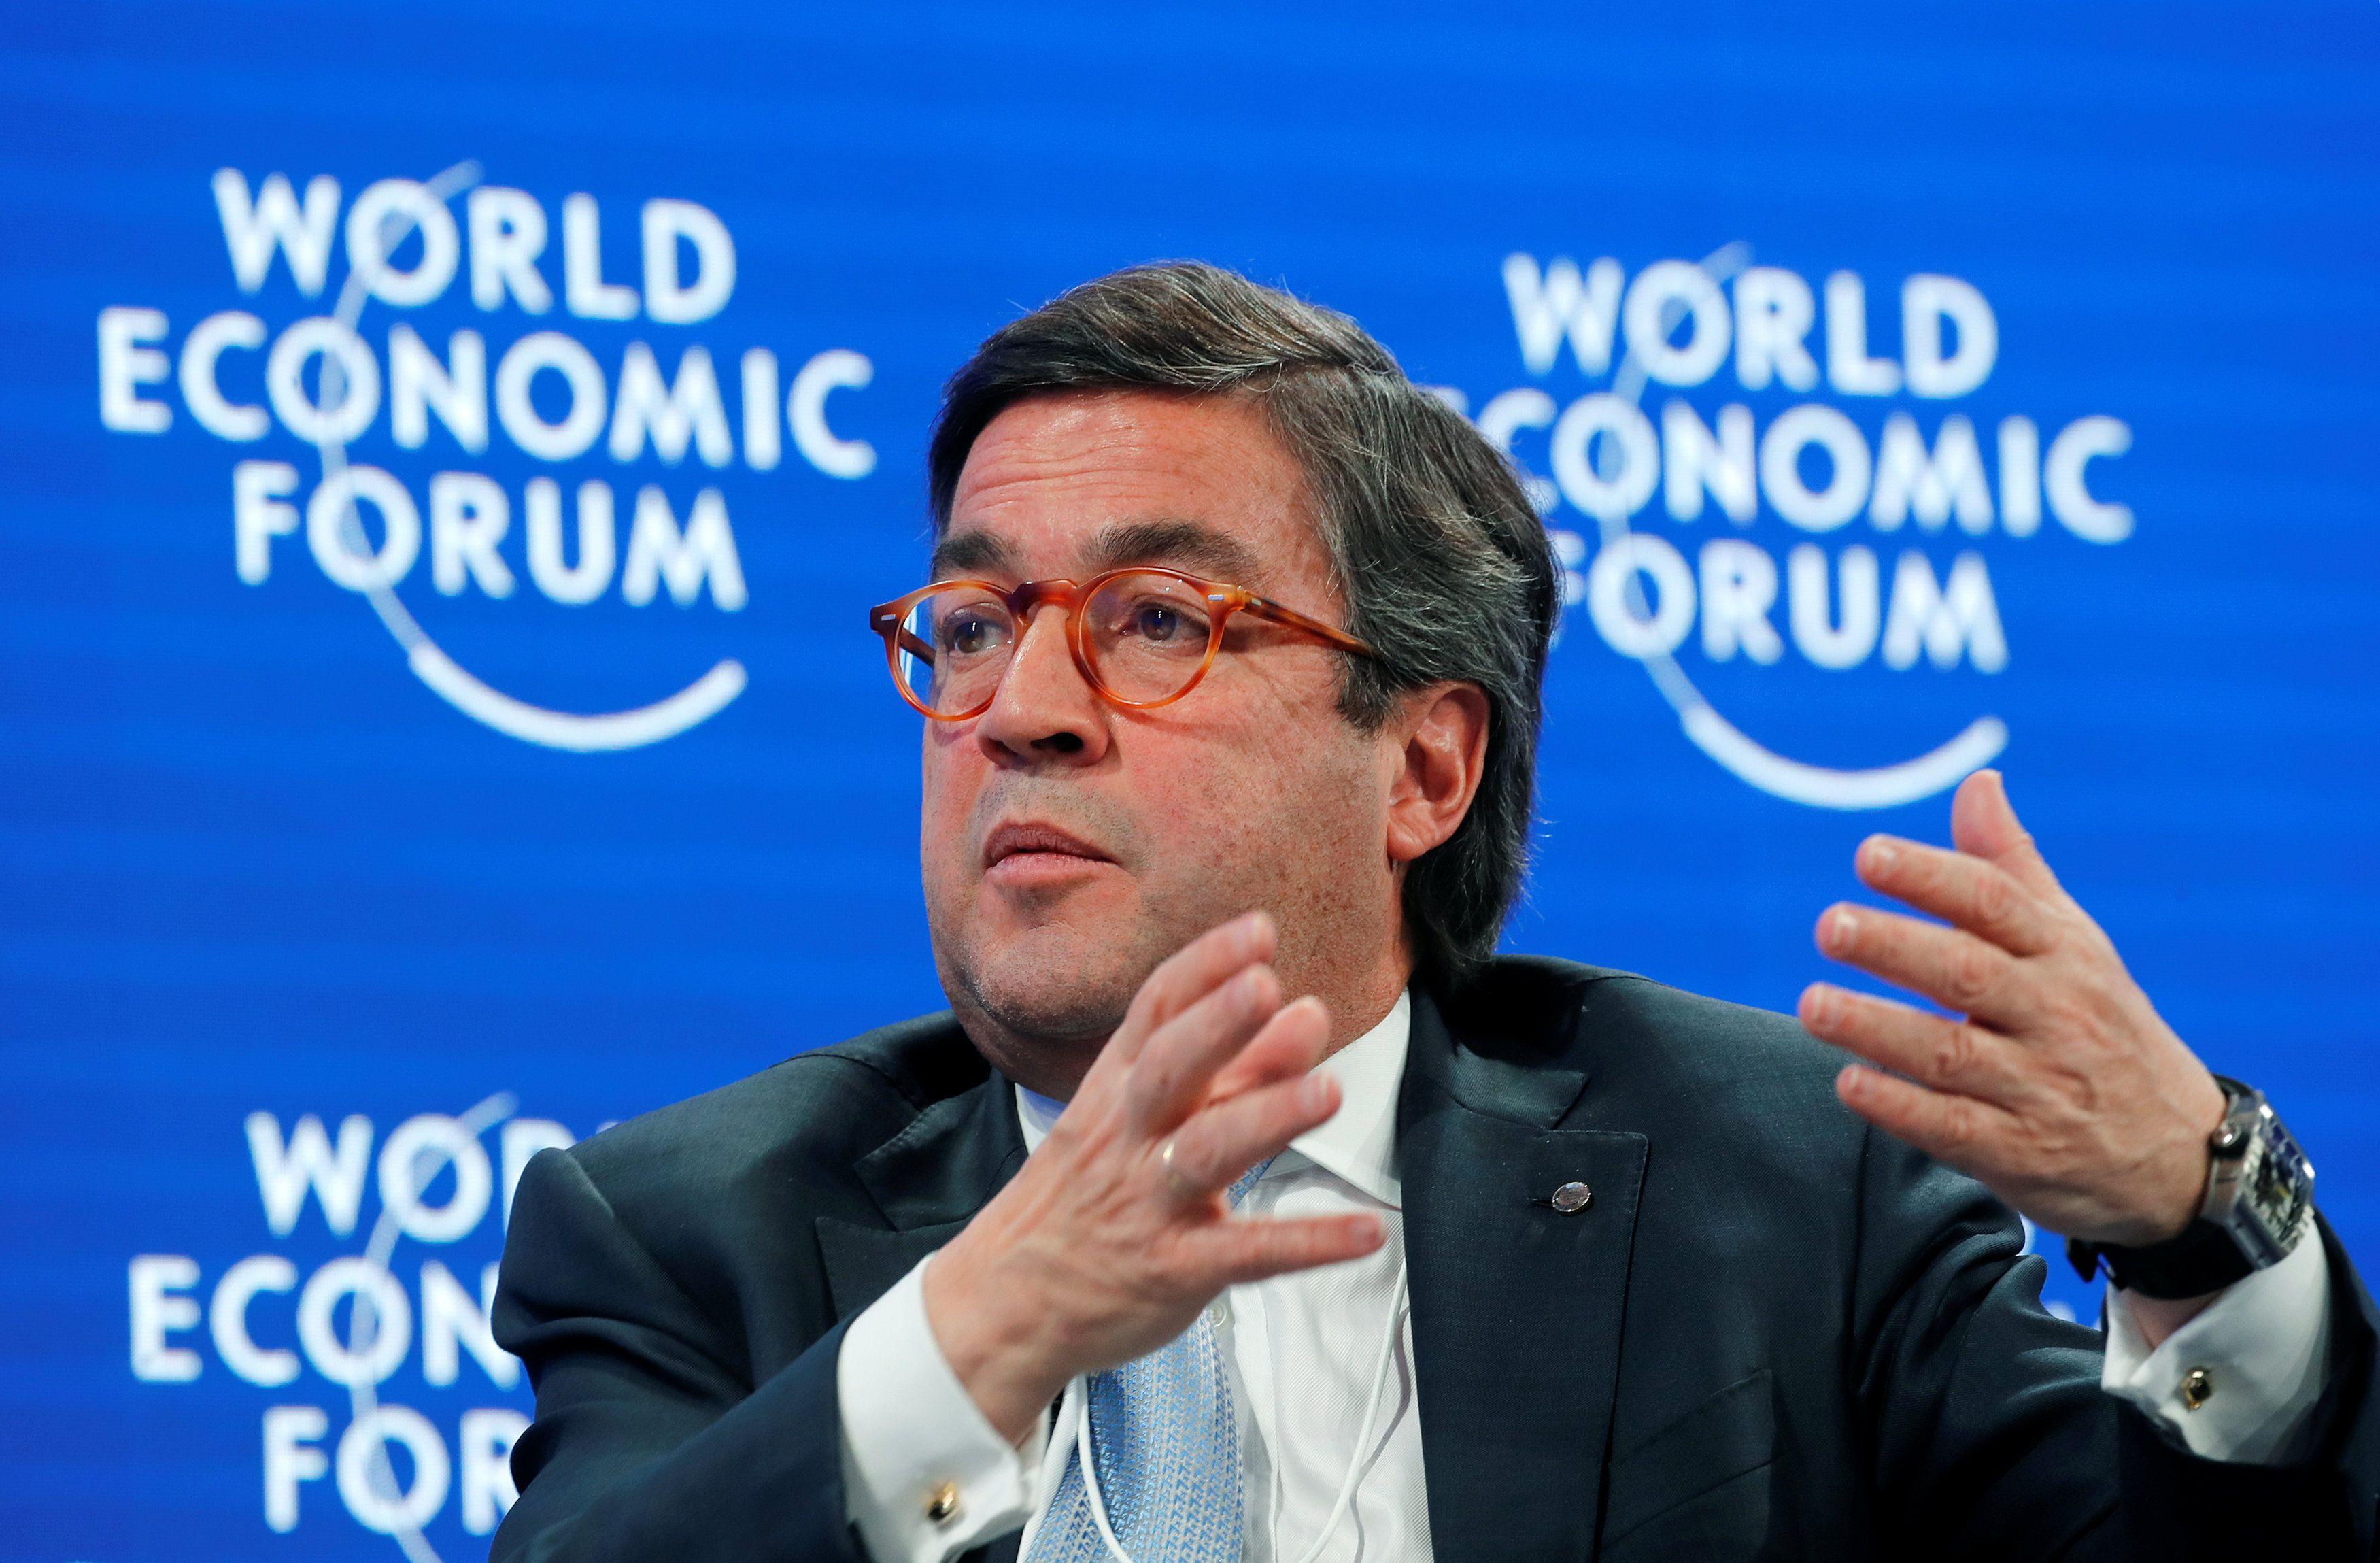 Luis Alberto Moreno, president of Inter-American Development Bank, attends the World Economic Forum (WEF) annual meeting in Davos, Switzerland, January 22, 2019. REUTERS/Arnd Wiegmann